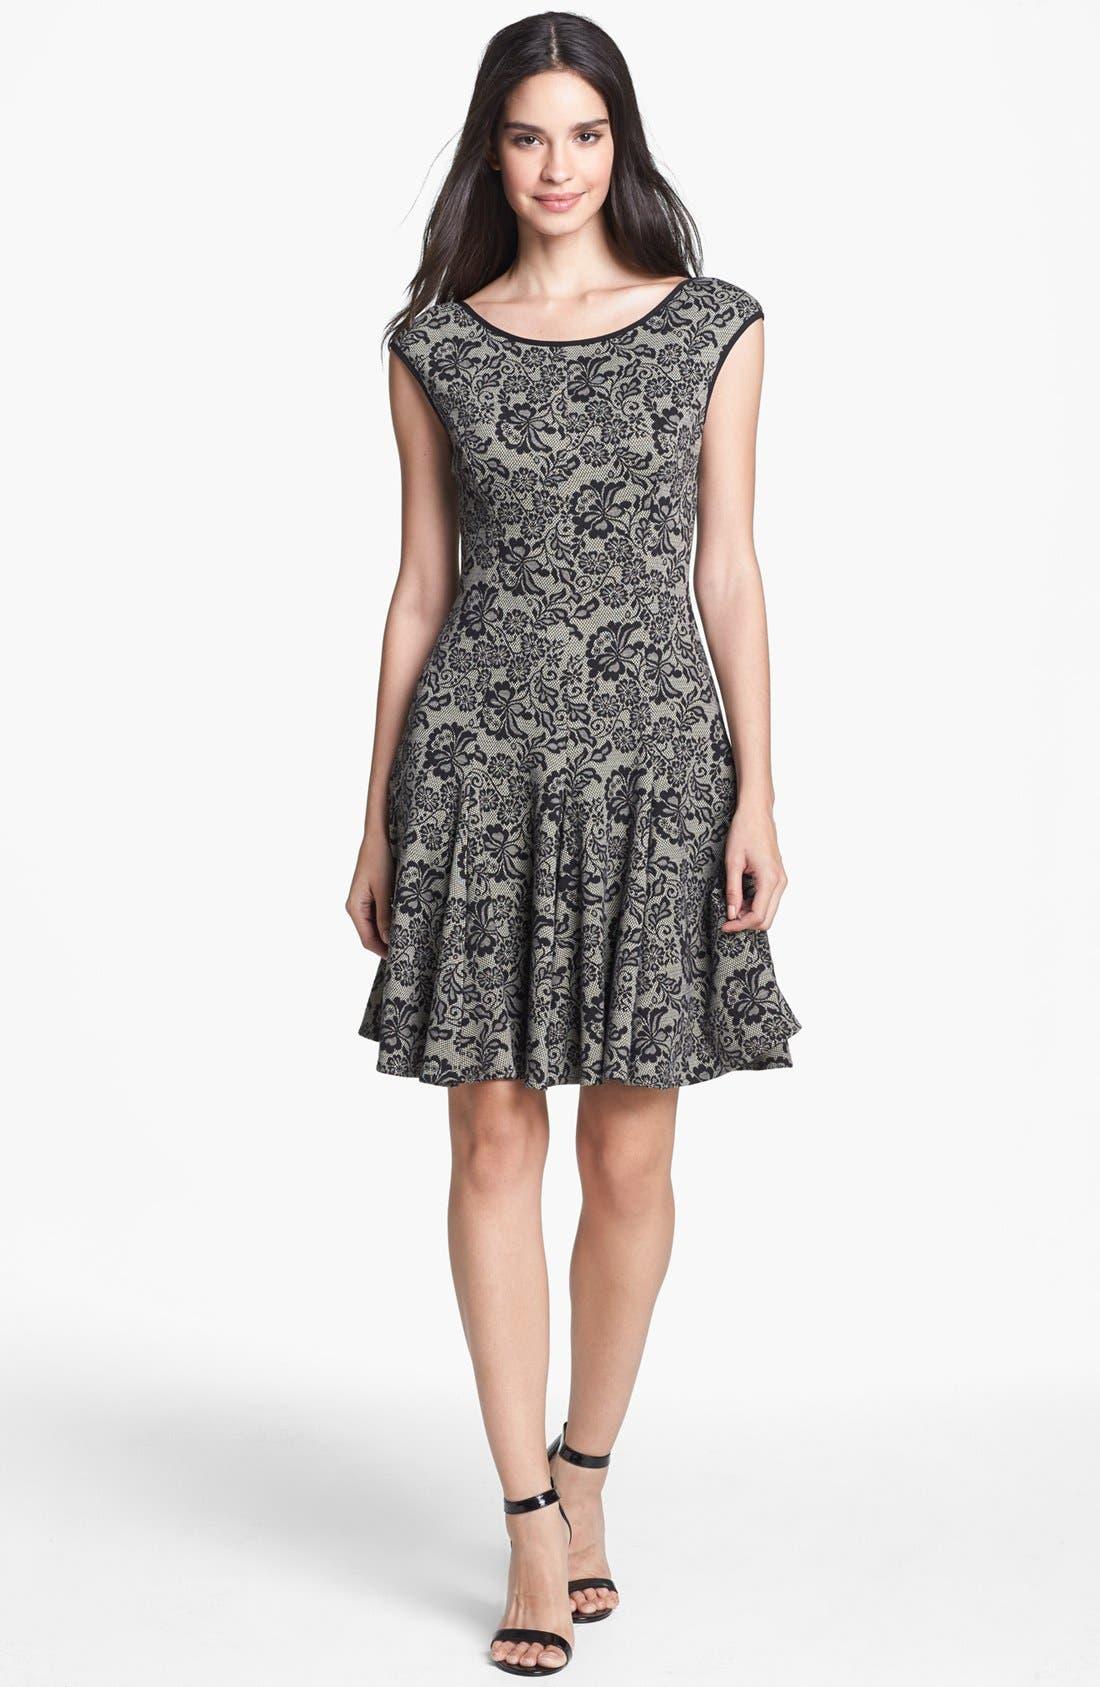 Main Image - Maggy London Lace Print Jacquard Fit & Flare Dress (Petite)